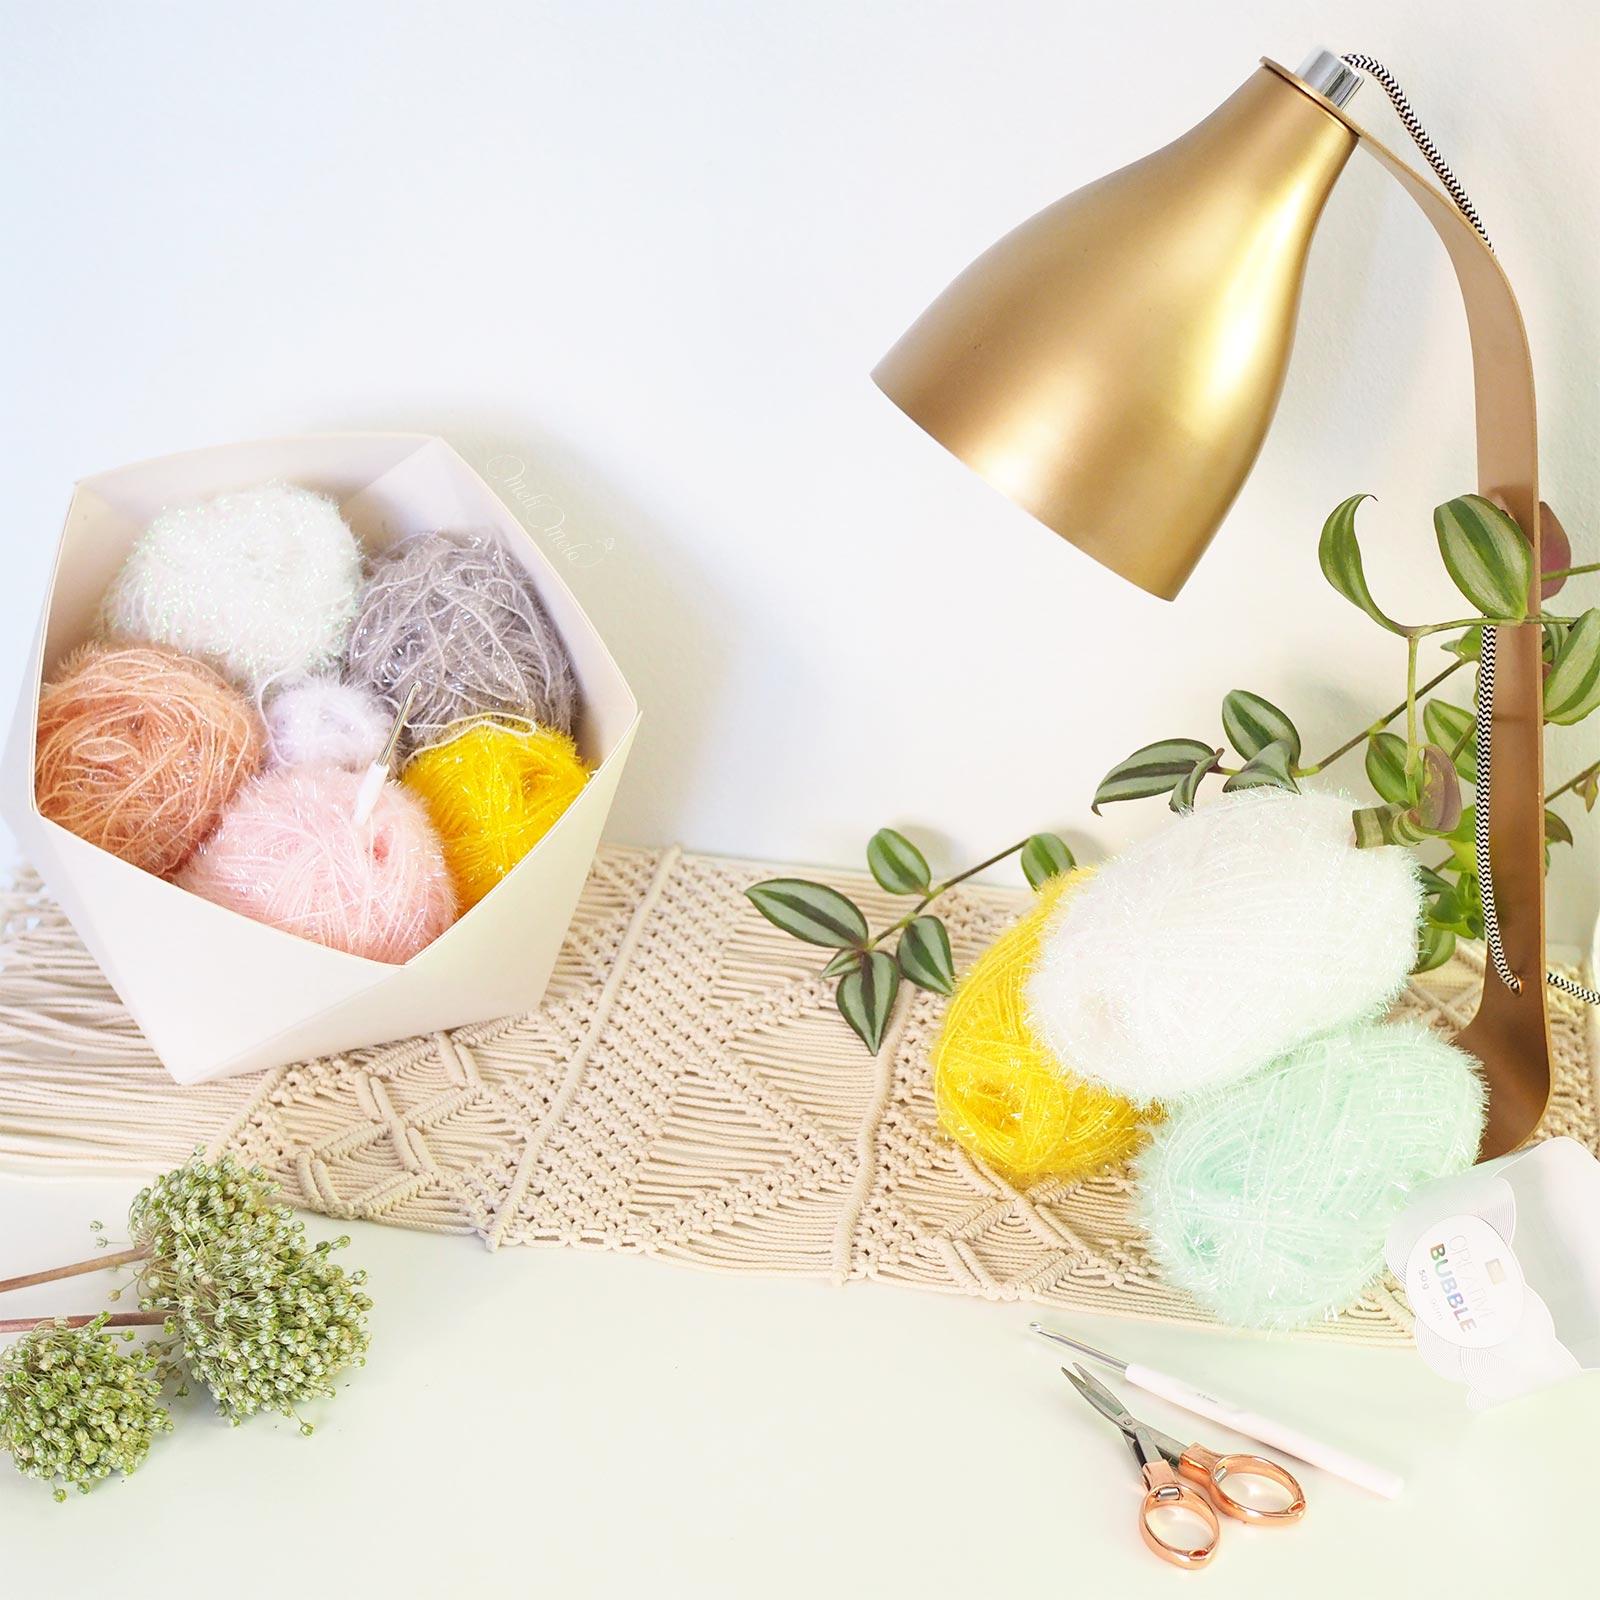 CALtawashi creative bubble rico design scrubber éponge tawashi crochet laboutiquedemelimelo